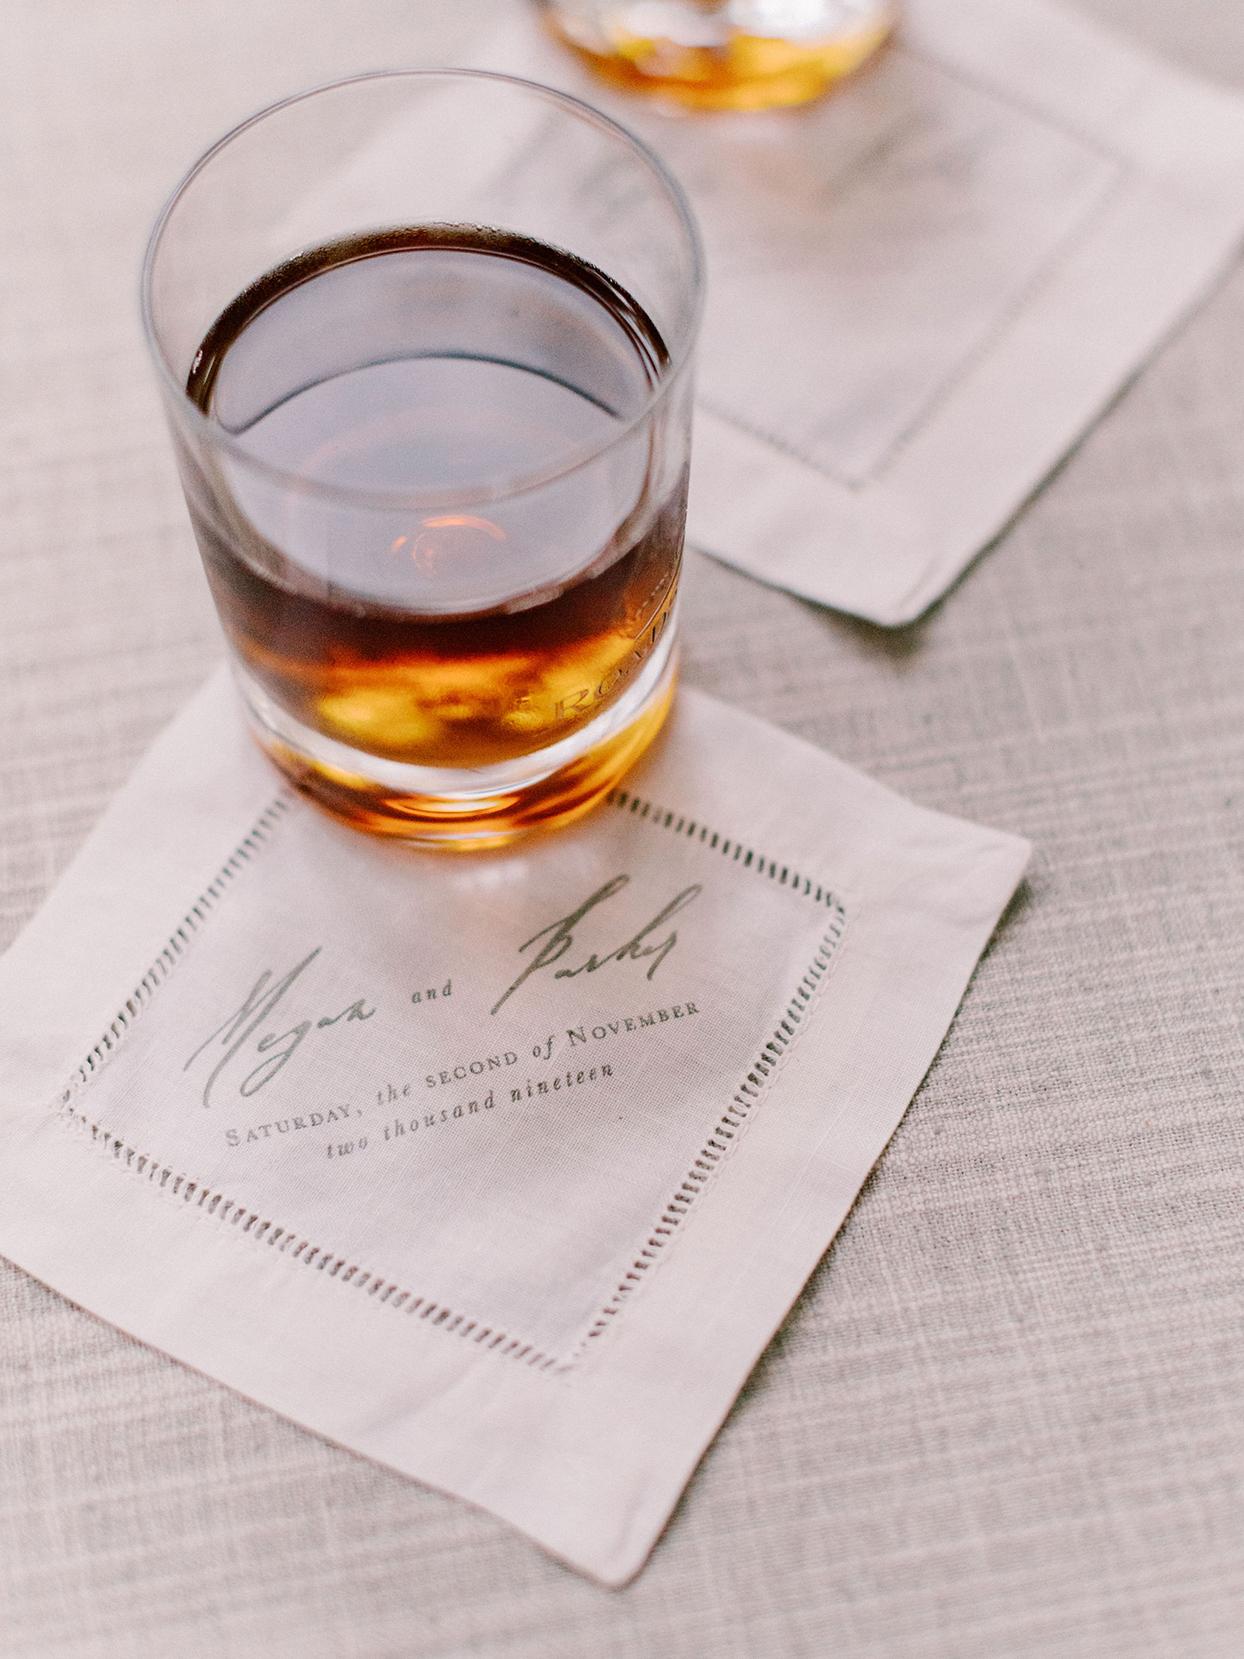 megan parking wedding rocks glass on customized reception cocktail napkins